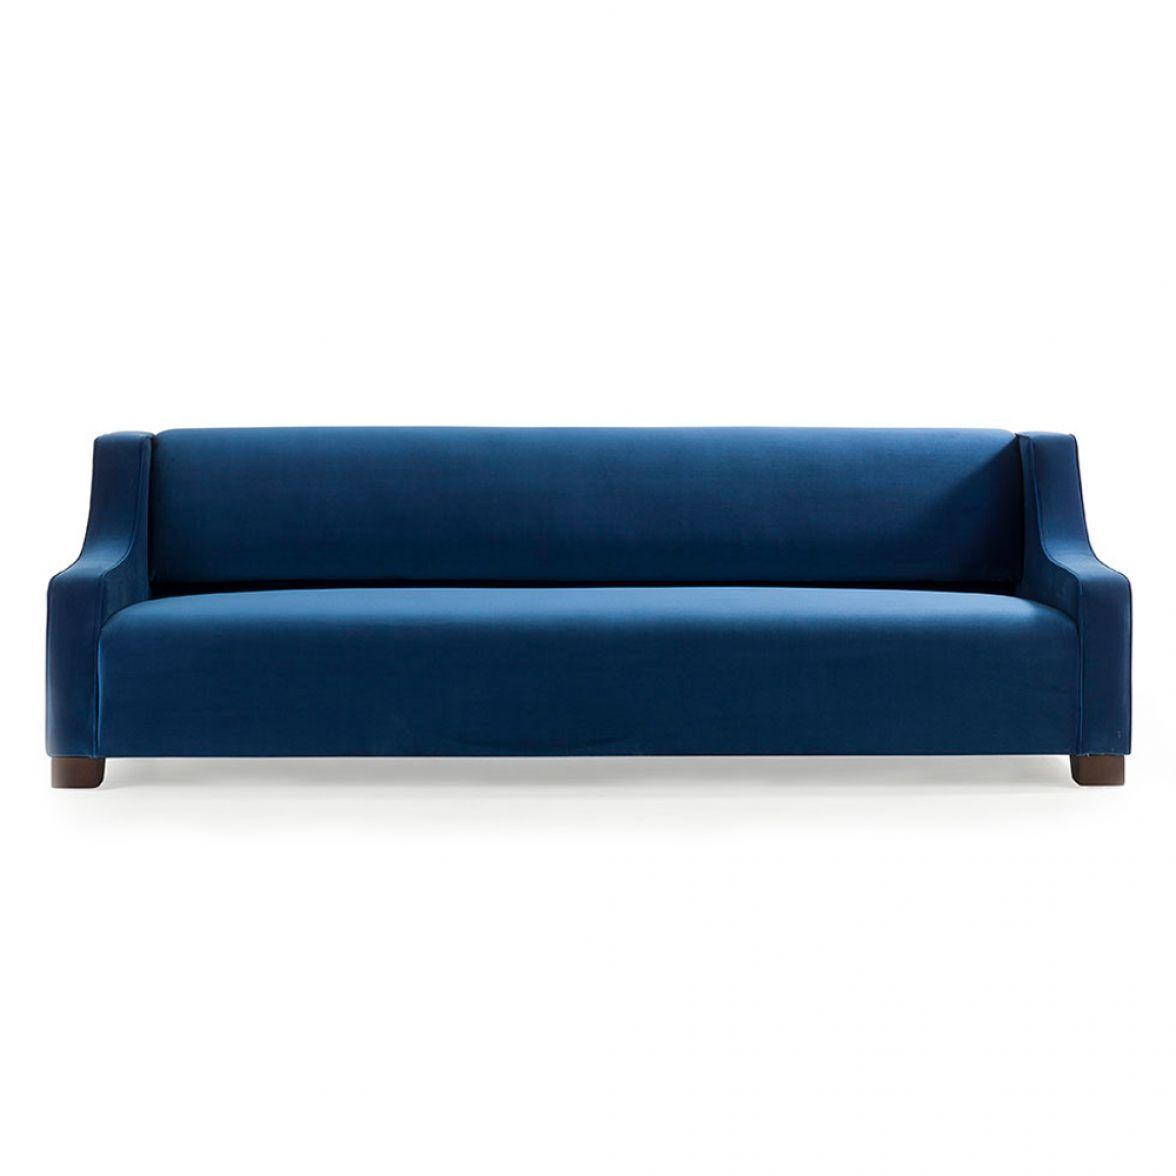 Big John sofa